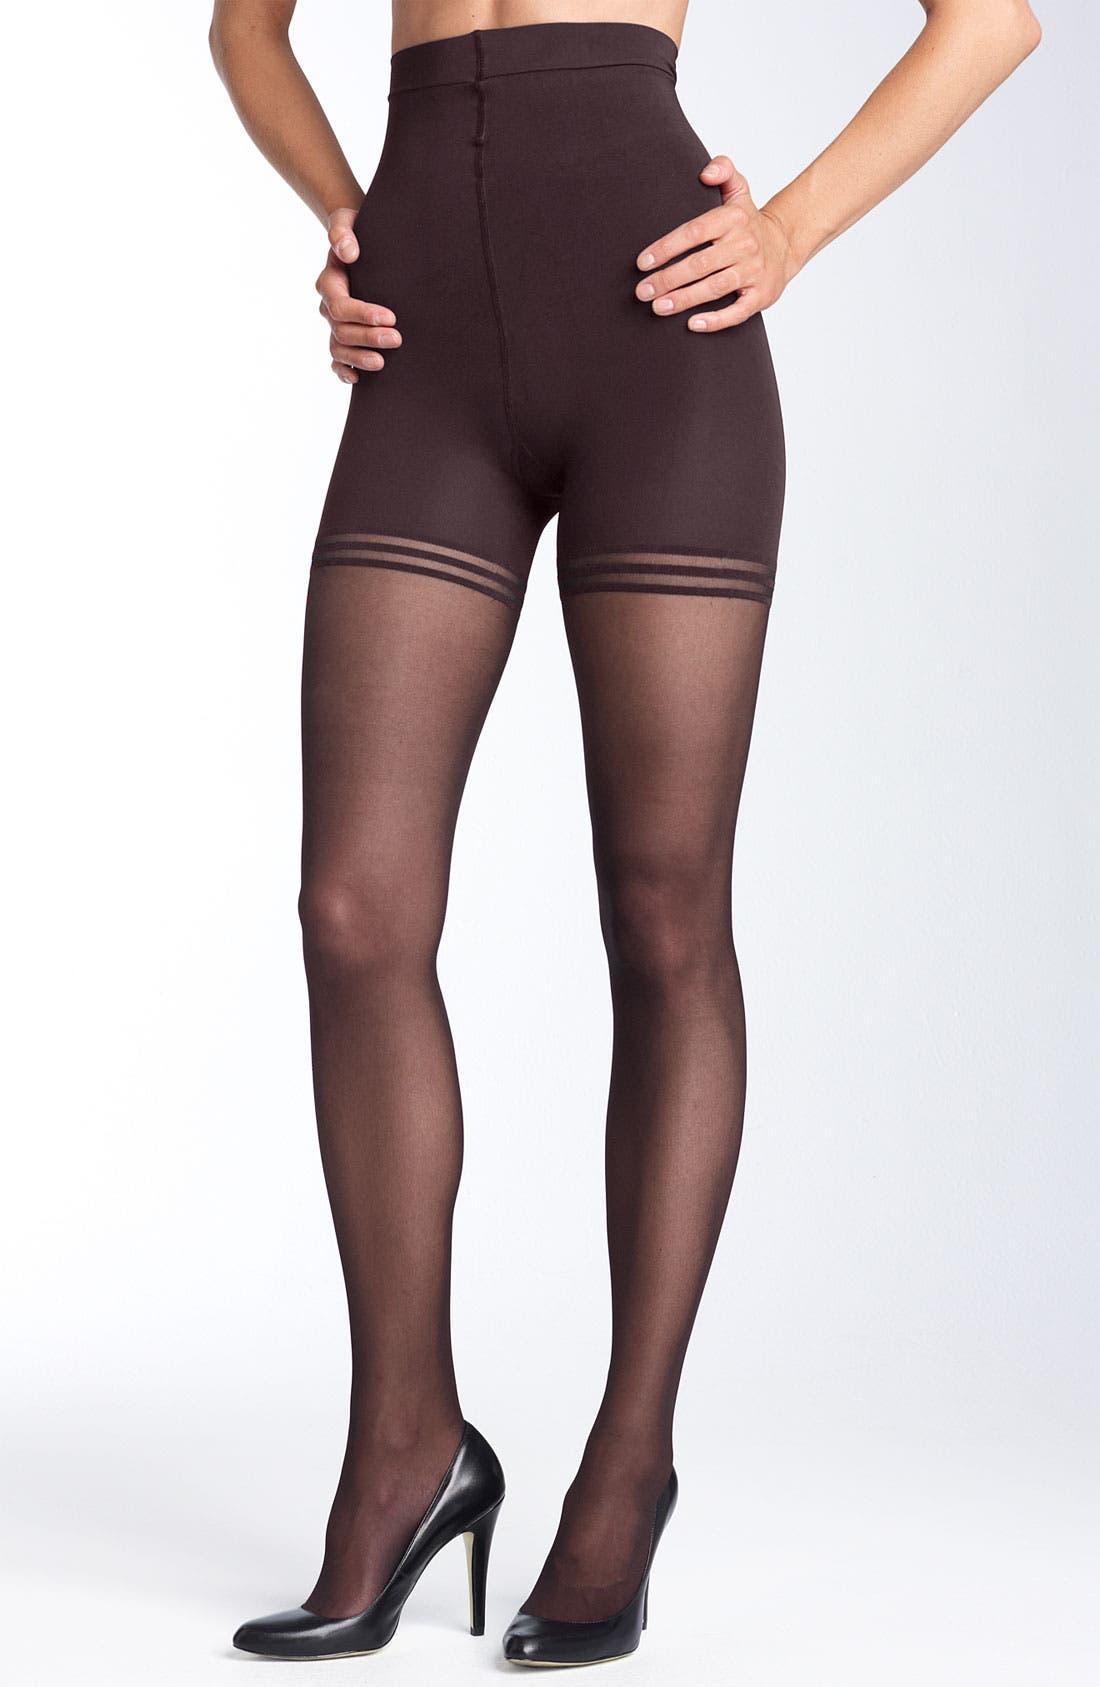 Main Image - Donna Karan 'Sheer Satin Ultimate Toner' Pantyhose